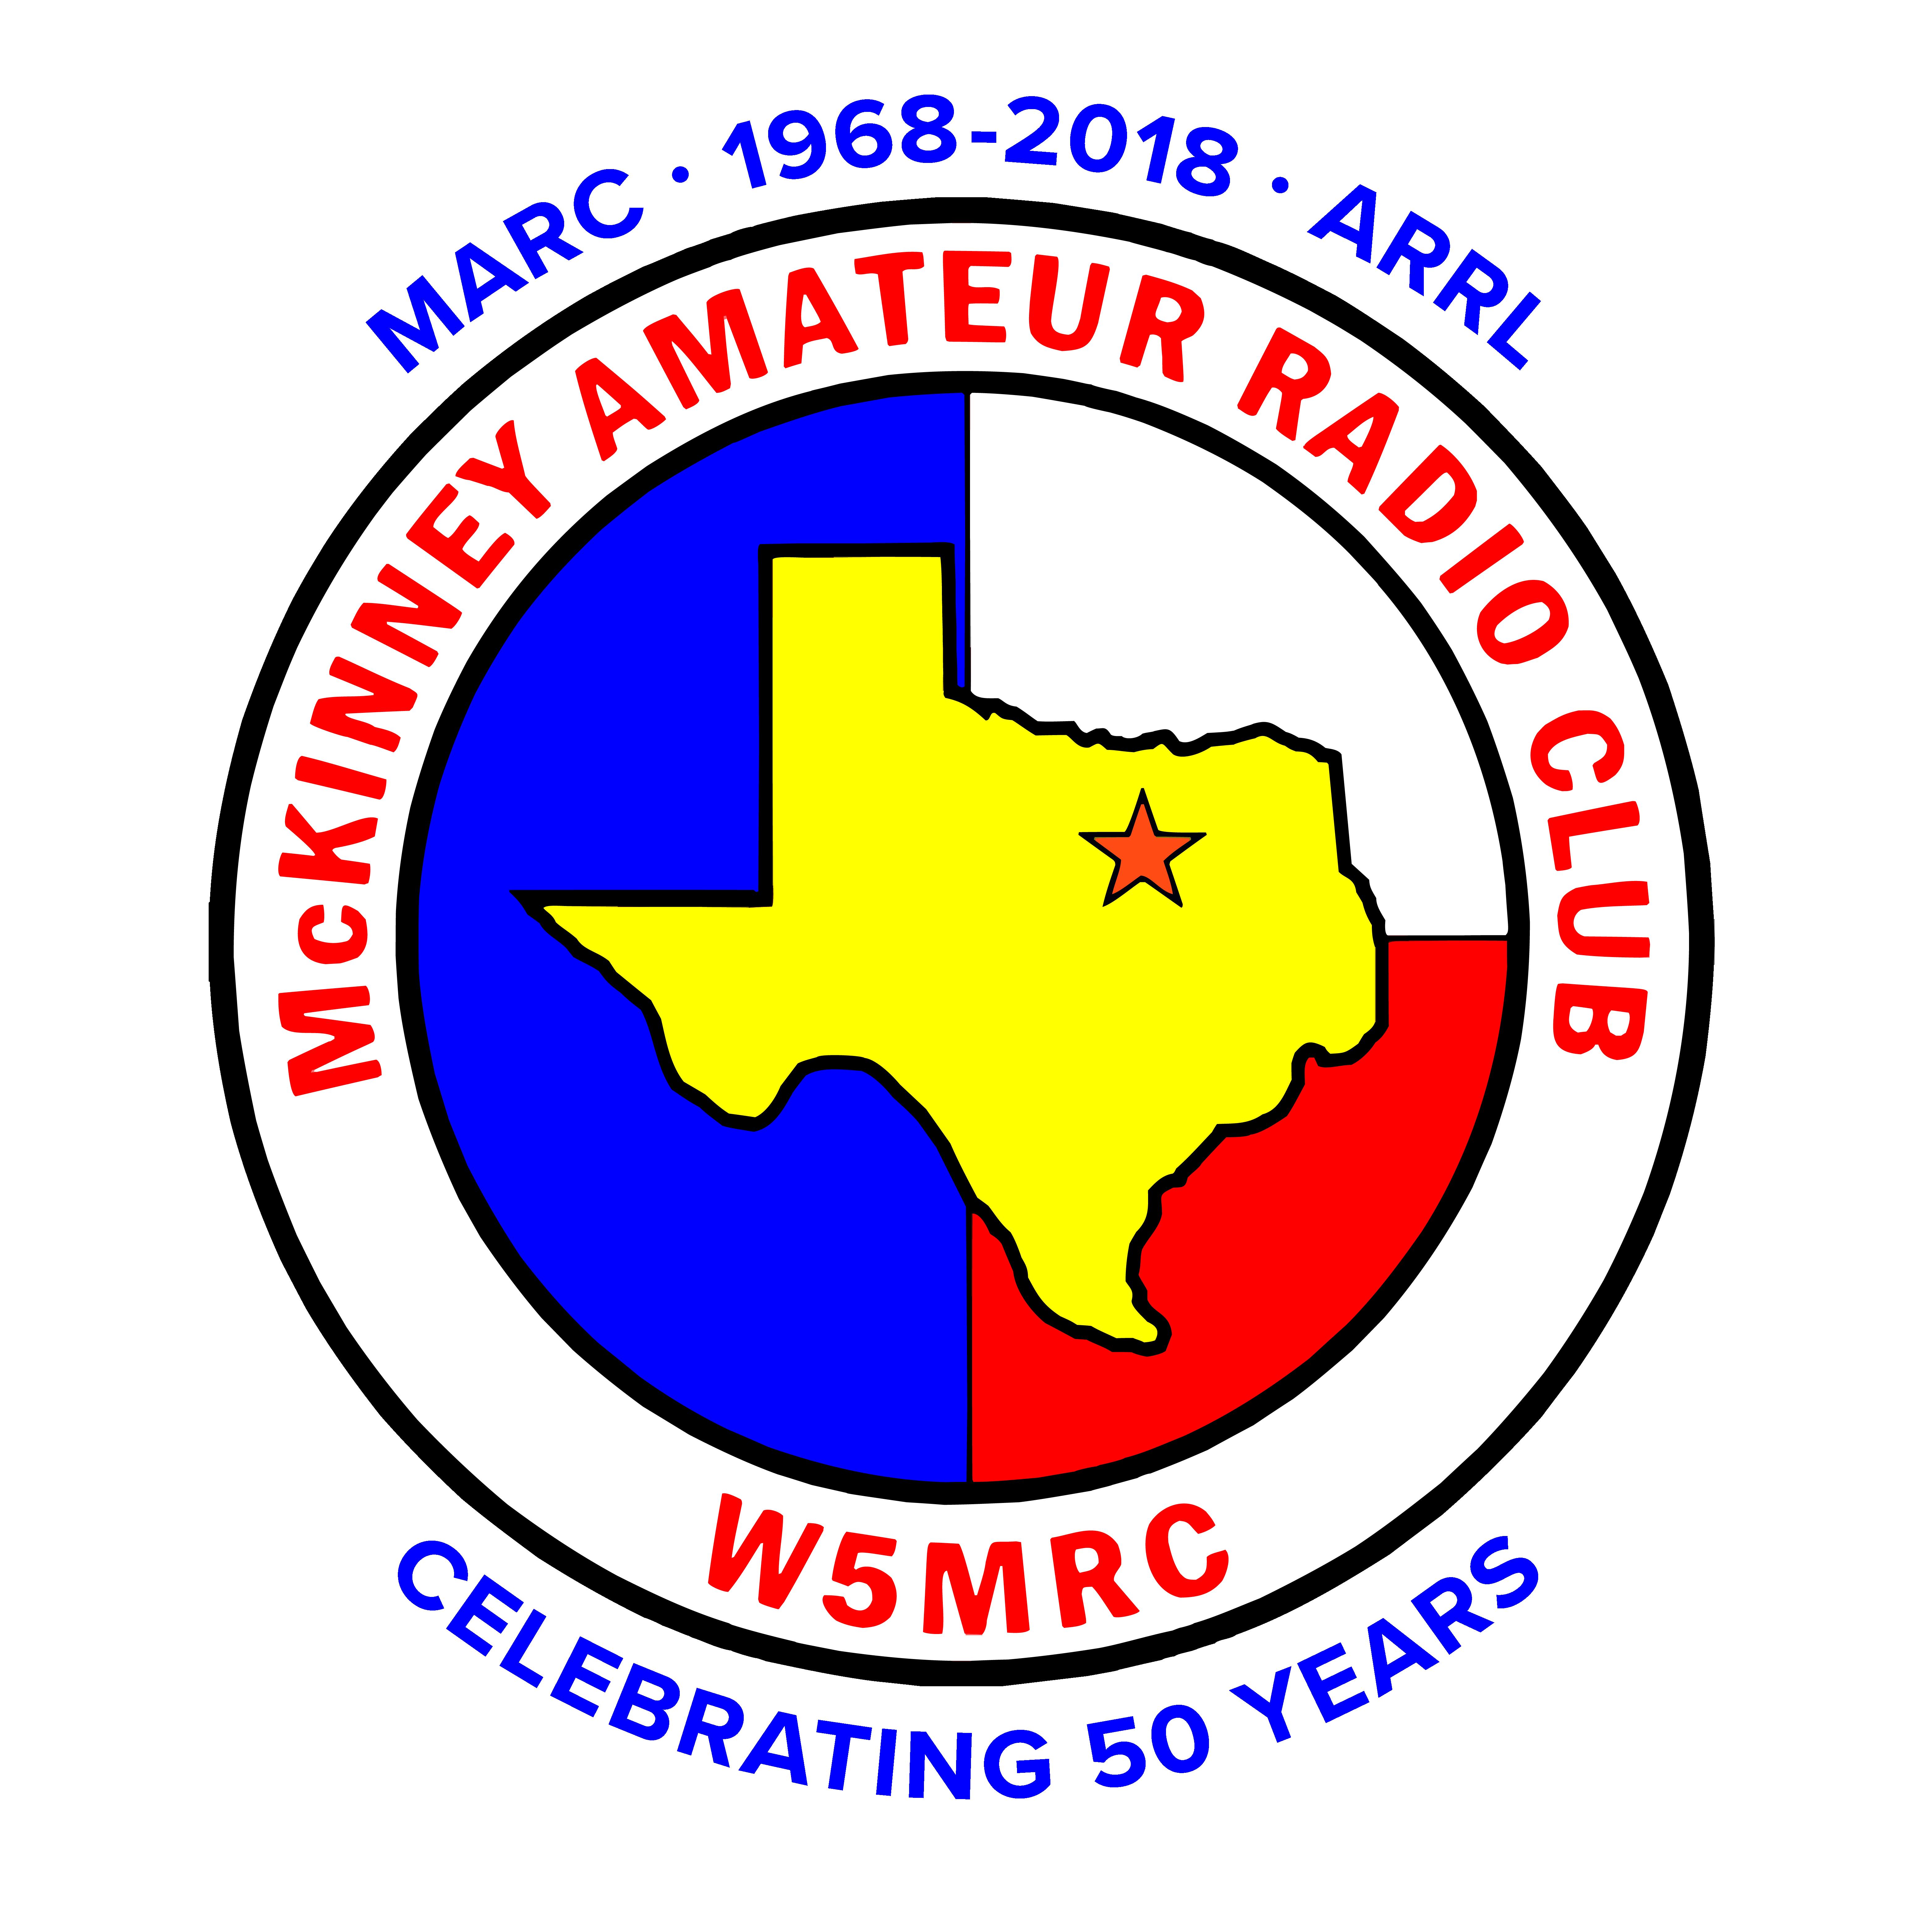 50th Anniversary W5MRC logo